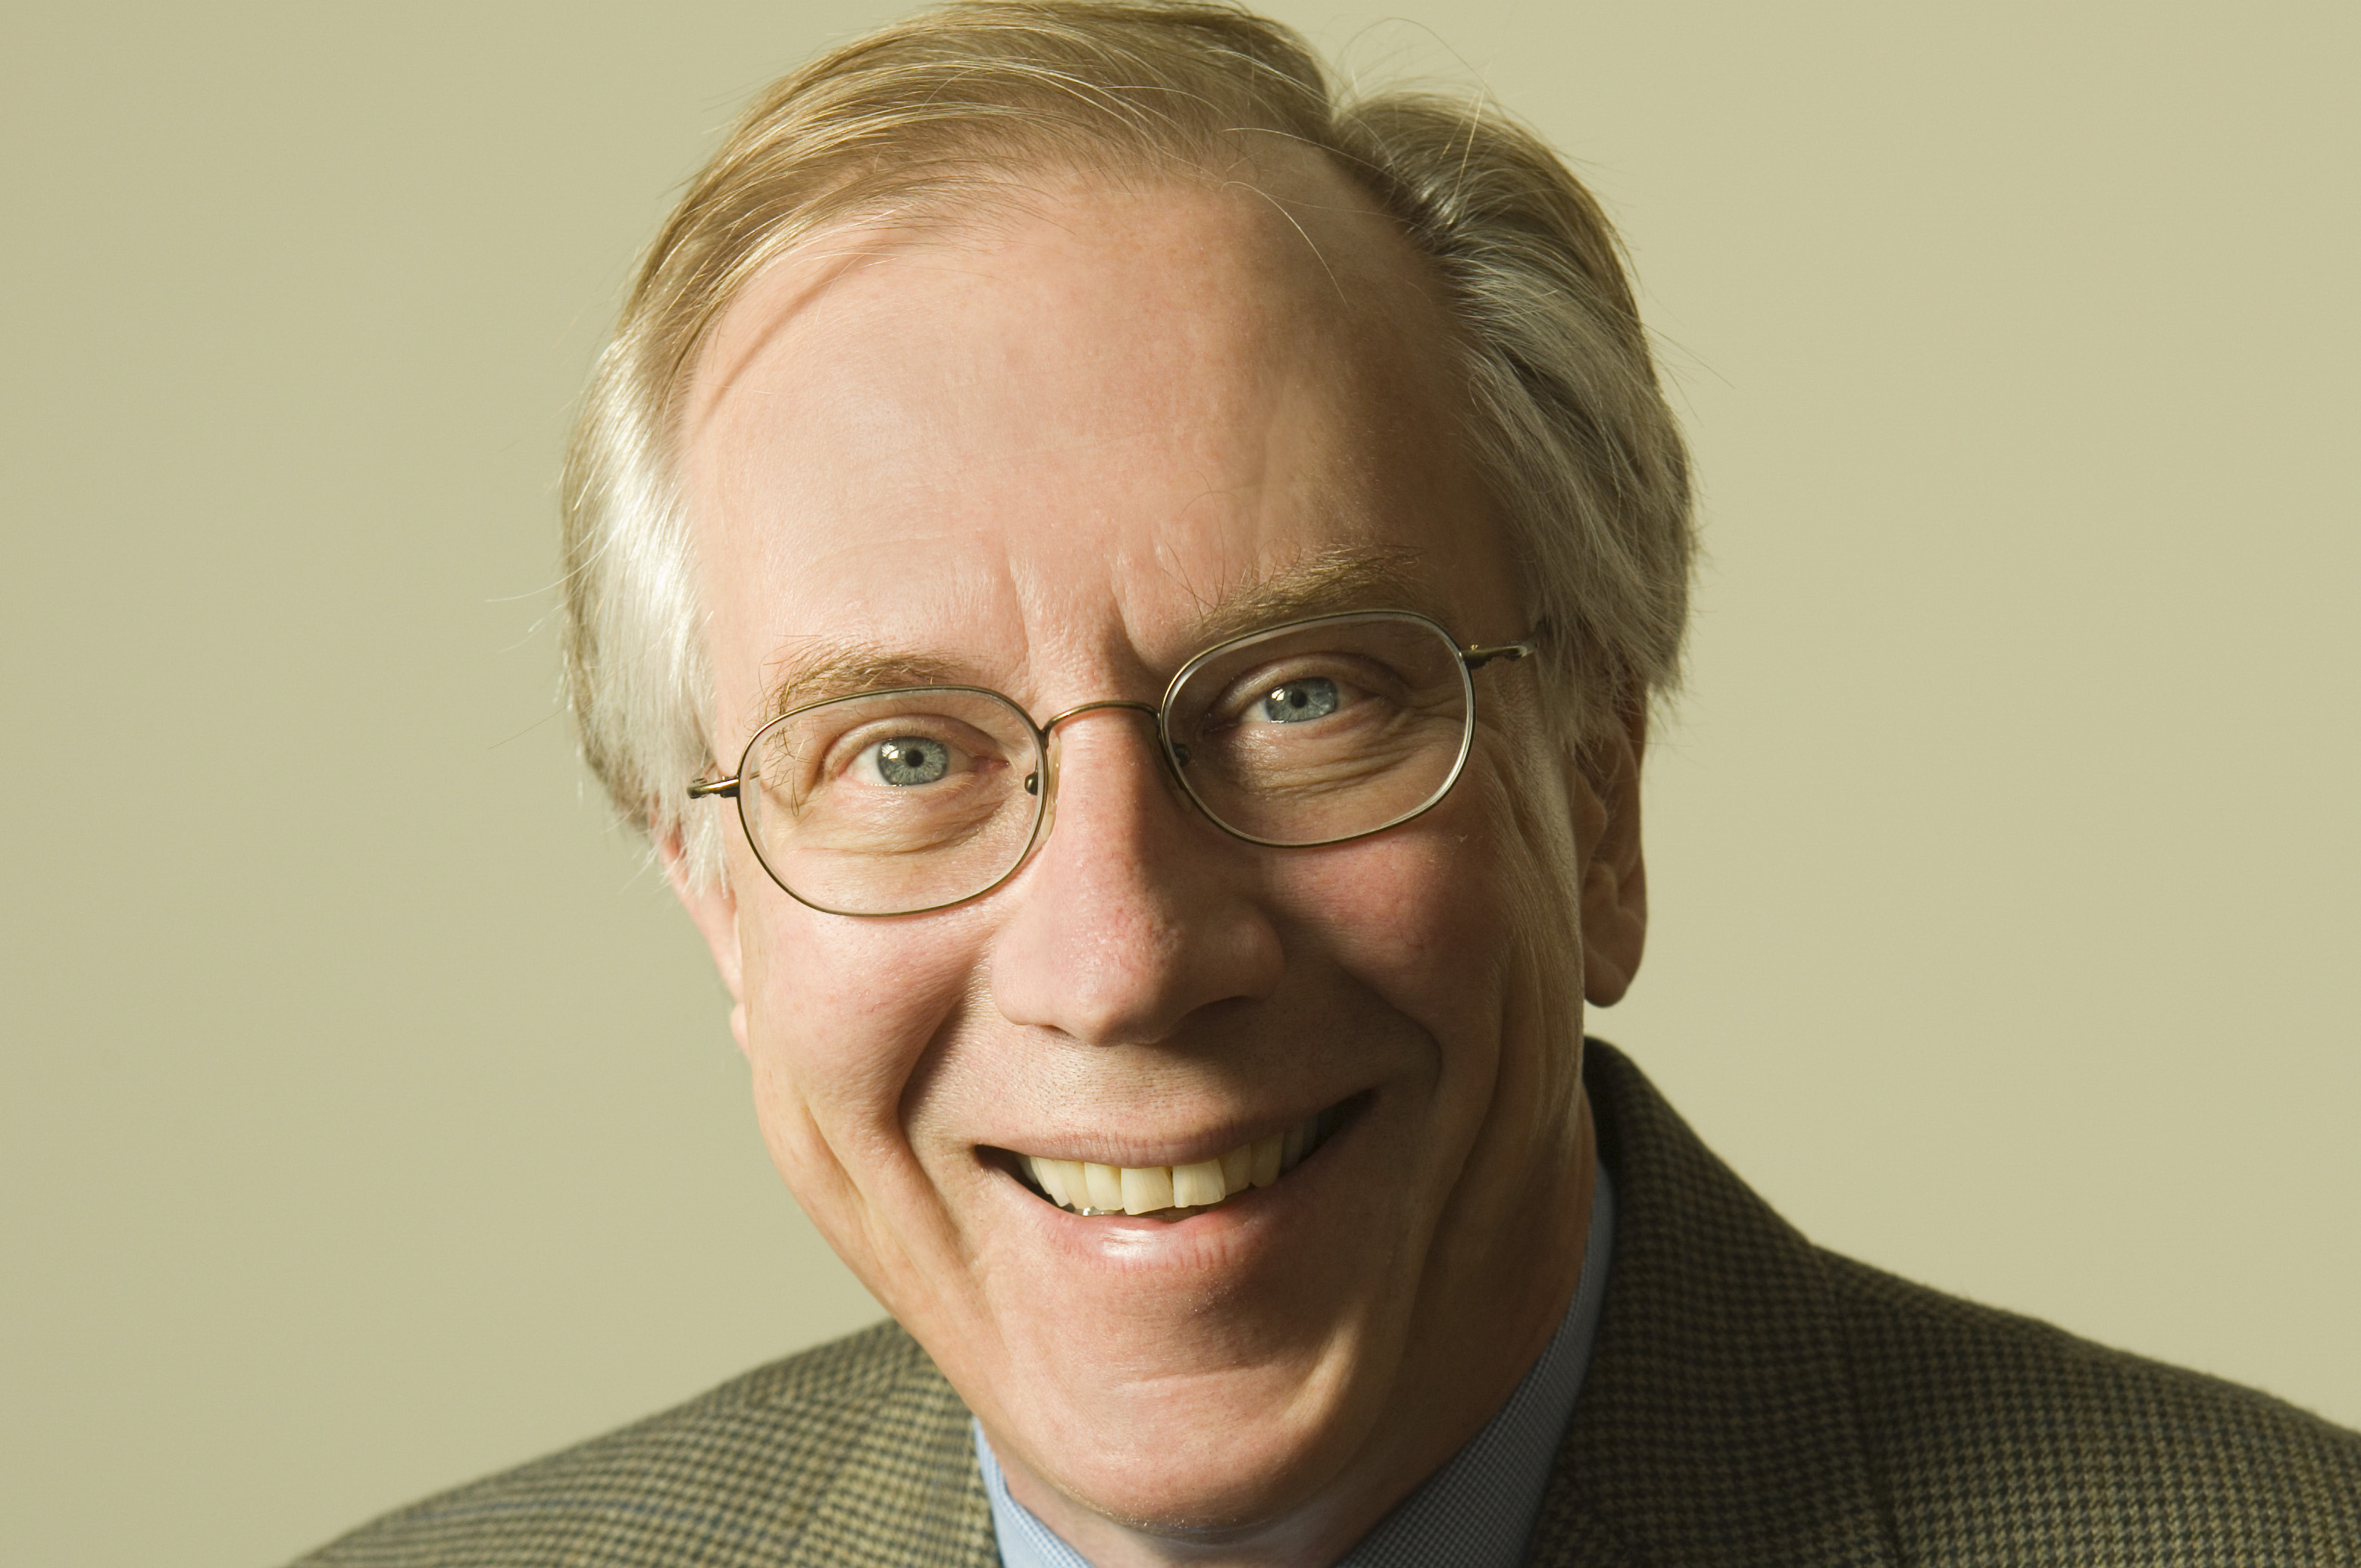 Photo of Thomas R. Cech, Ph.D.